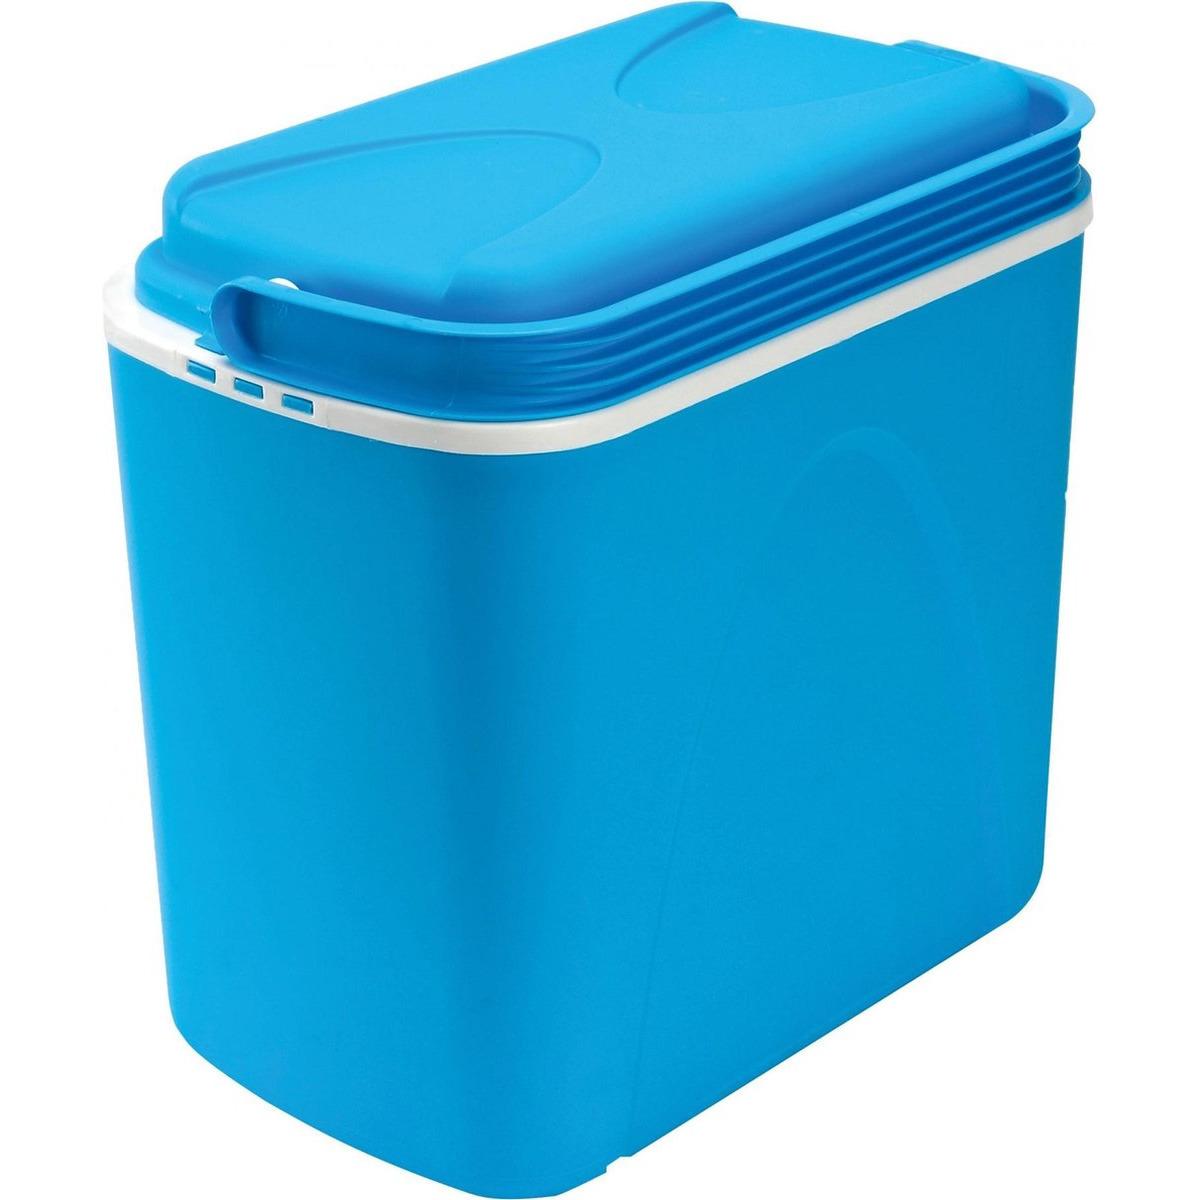 Koelbox blauw 24 liter 40 x 25 x 37 cm